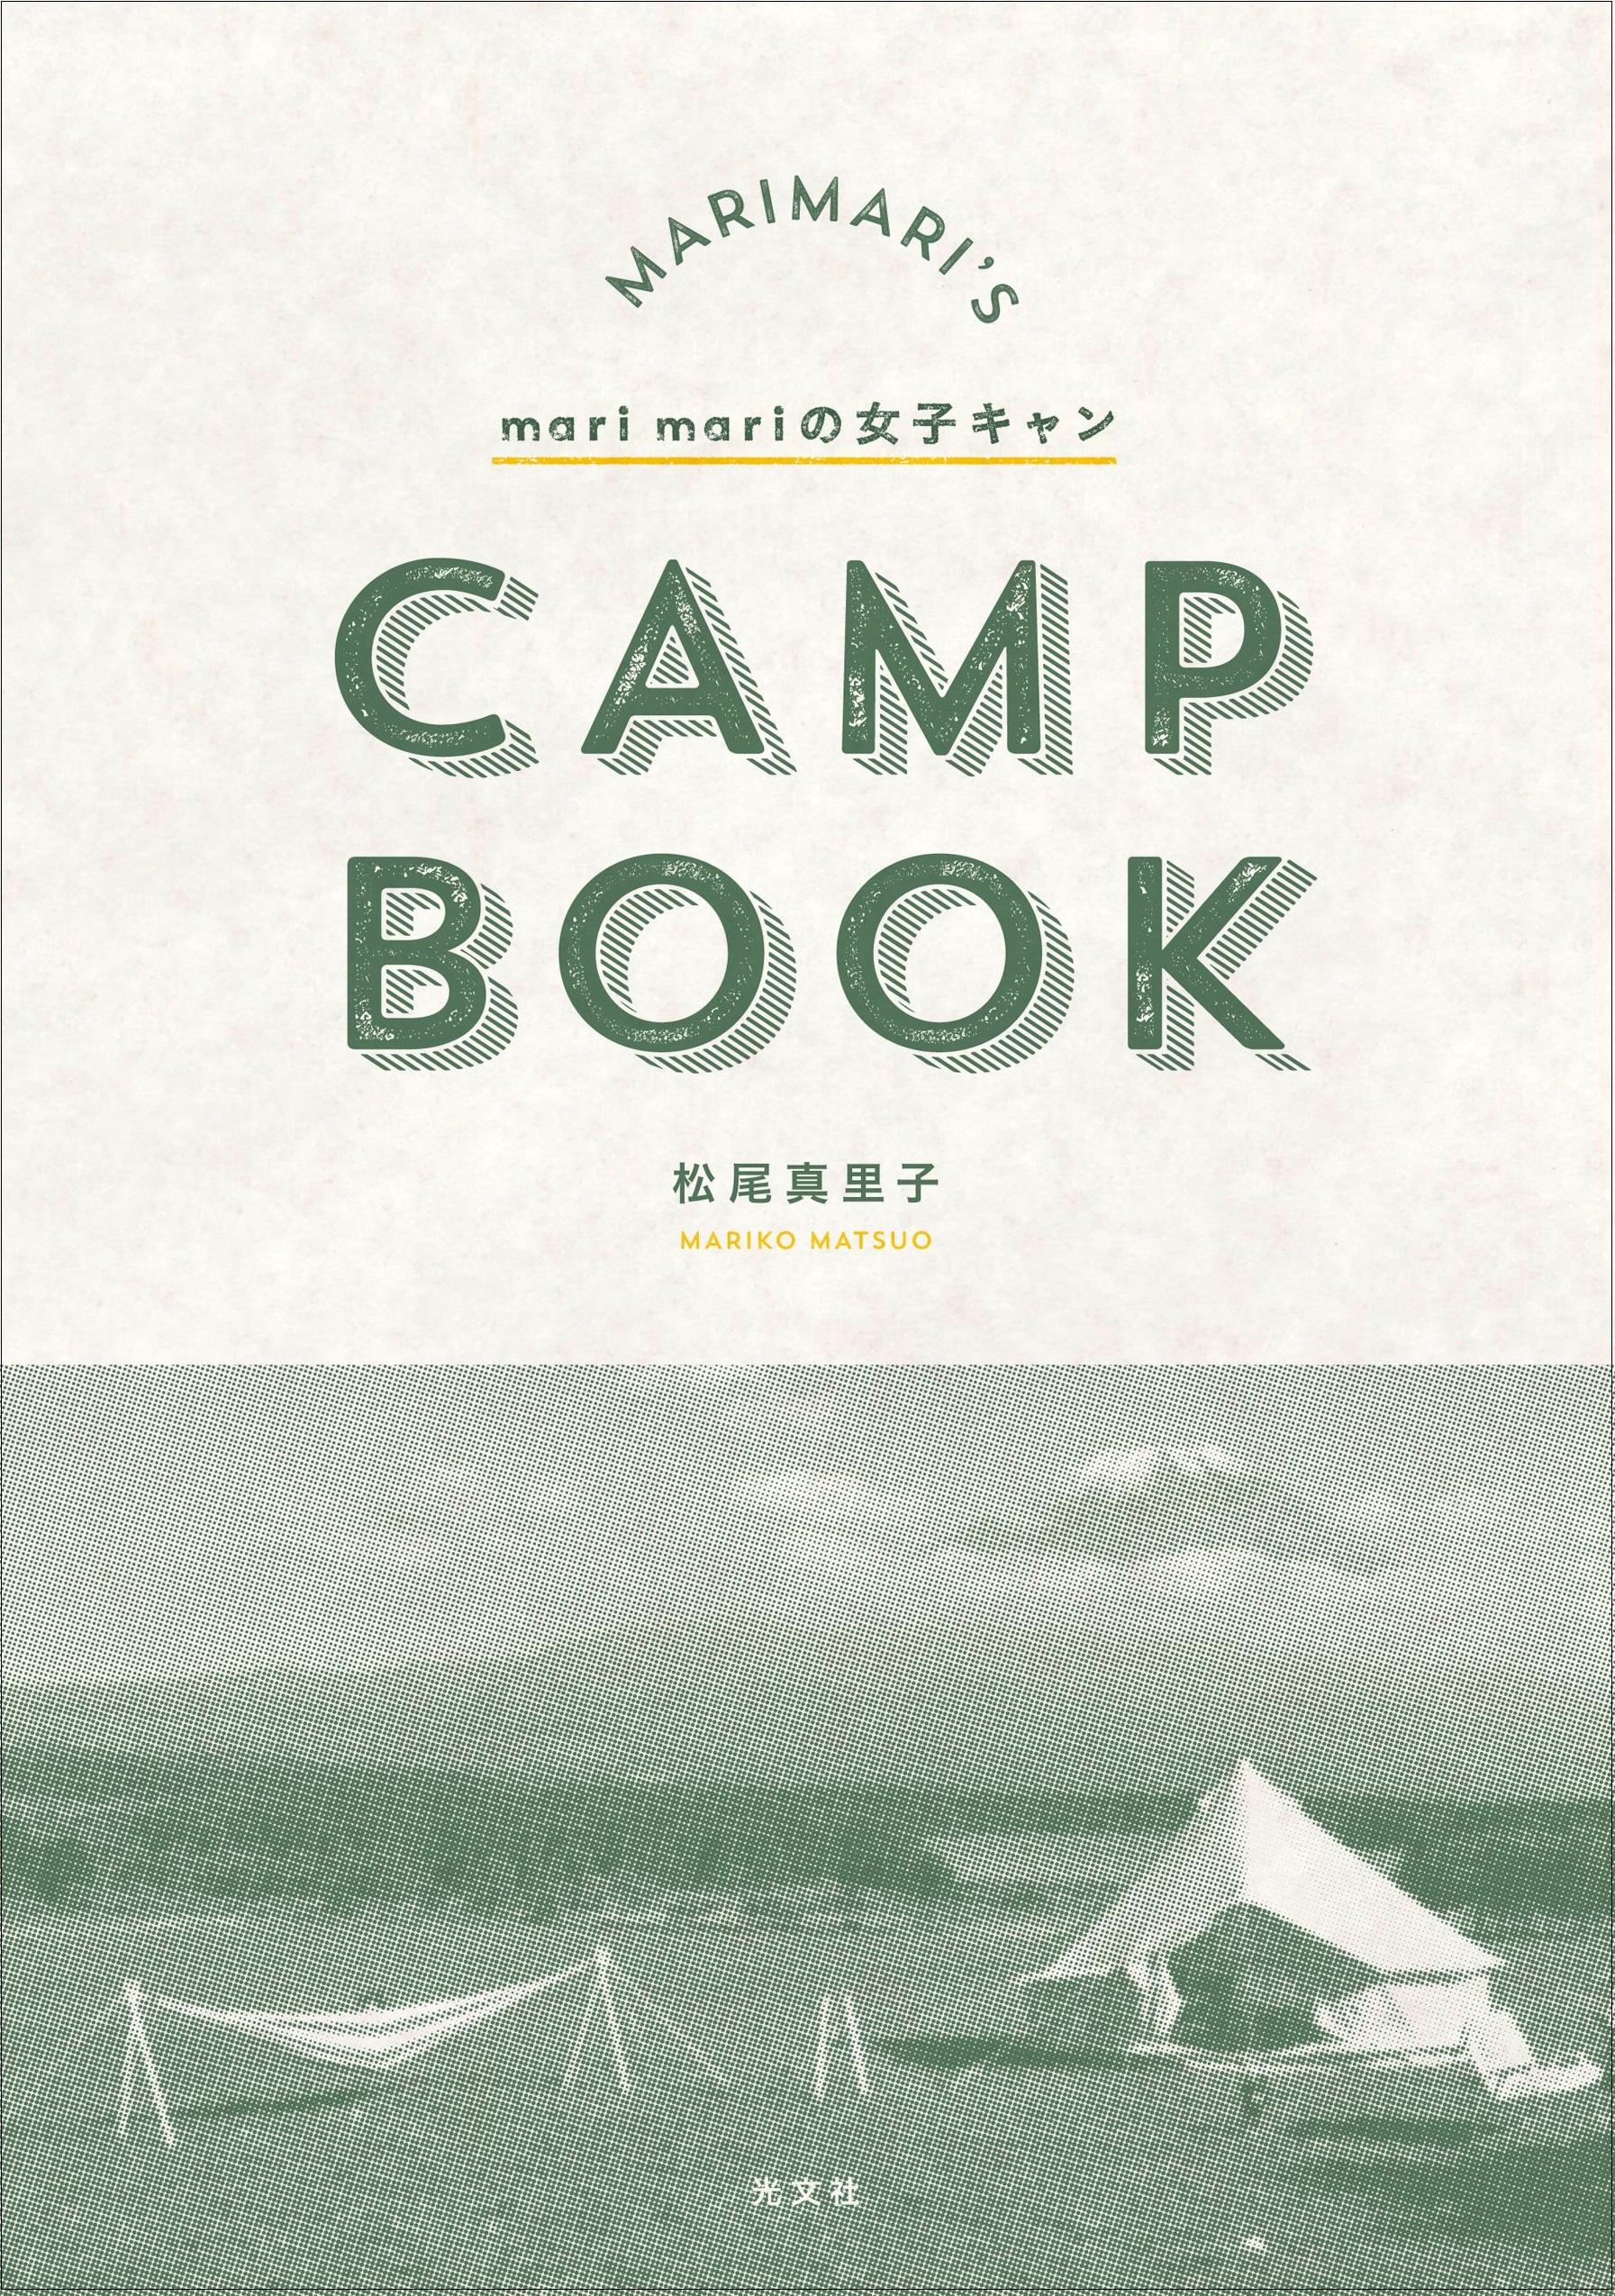 Marimari's Camp Book